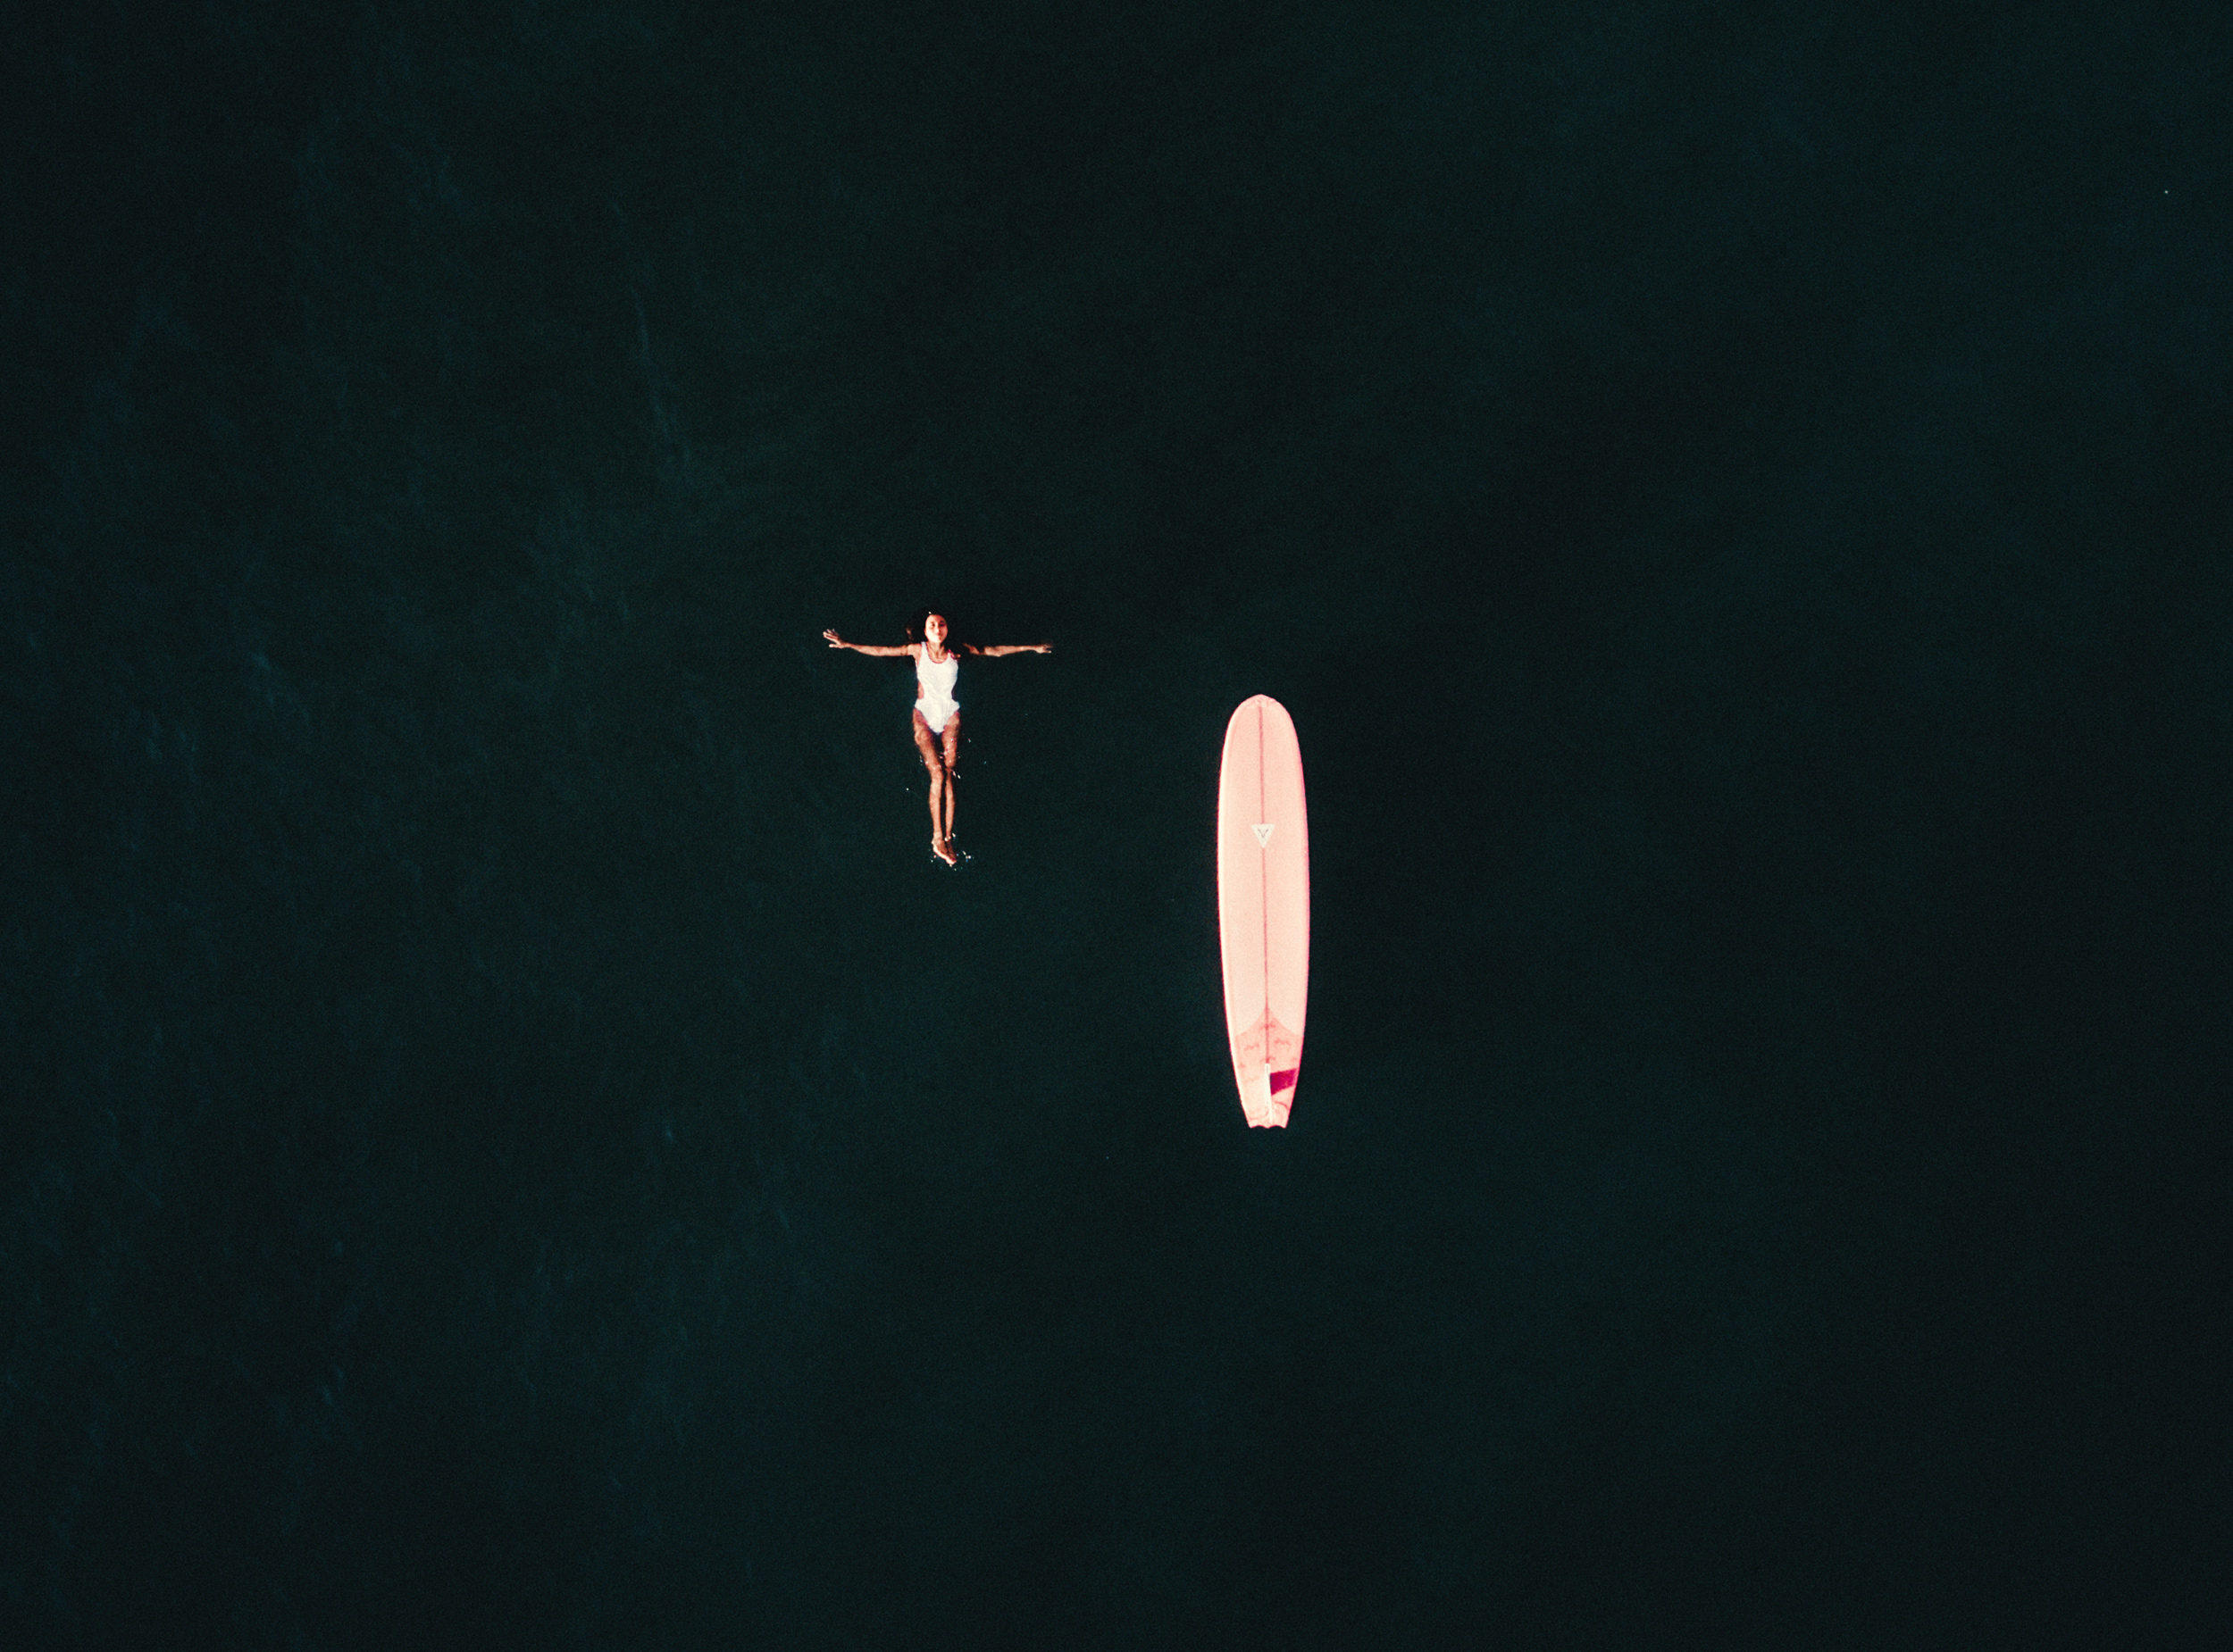 FLKLR surfboards